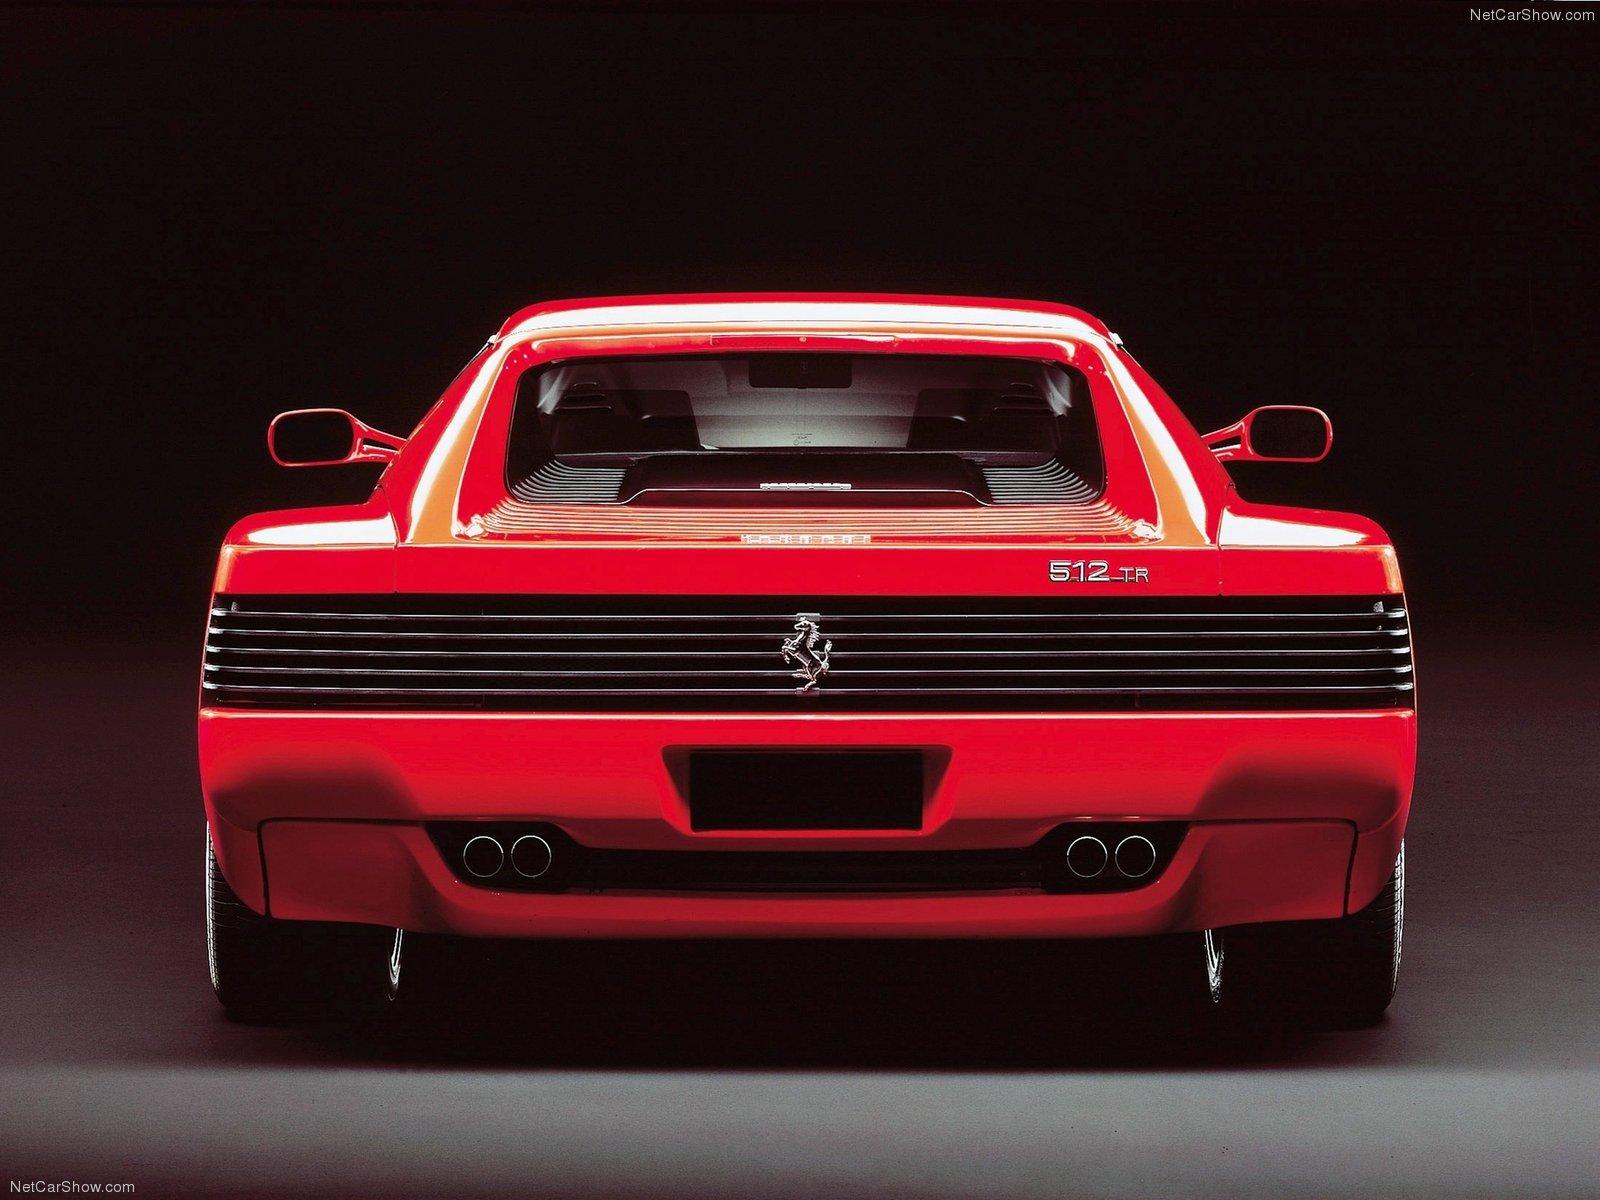 Ferrari 512 Tr For Wiring Diagram | Wiring Diagram on ferrari 328 gts, ferrari 456 m, ferrari 599xx, ferrari testarossa, ferrari f355, ferrari california, ferrari 512m, ferrari 458 italia, ferrari f12, ferrari 599 gtb fiorano, ferrari f512m, ferrari 550 maranello, ferrari 456 gt, ferrari 458 grigio medio, ferrari f50, ferrari gto, ferrari f40, ferrari 612 scaglietti,